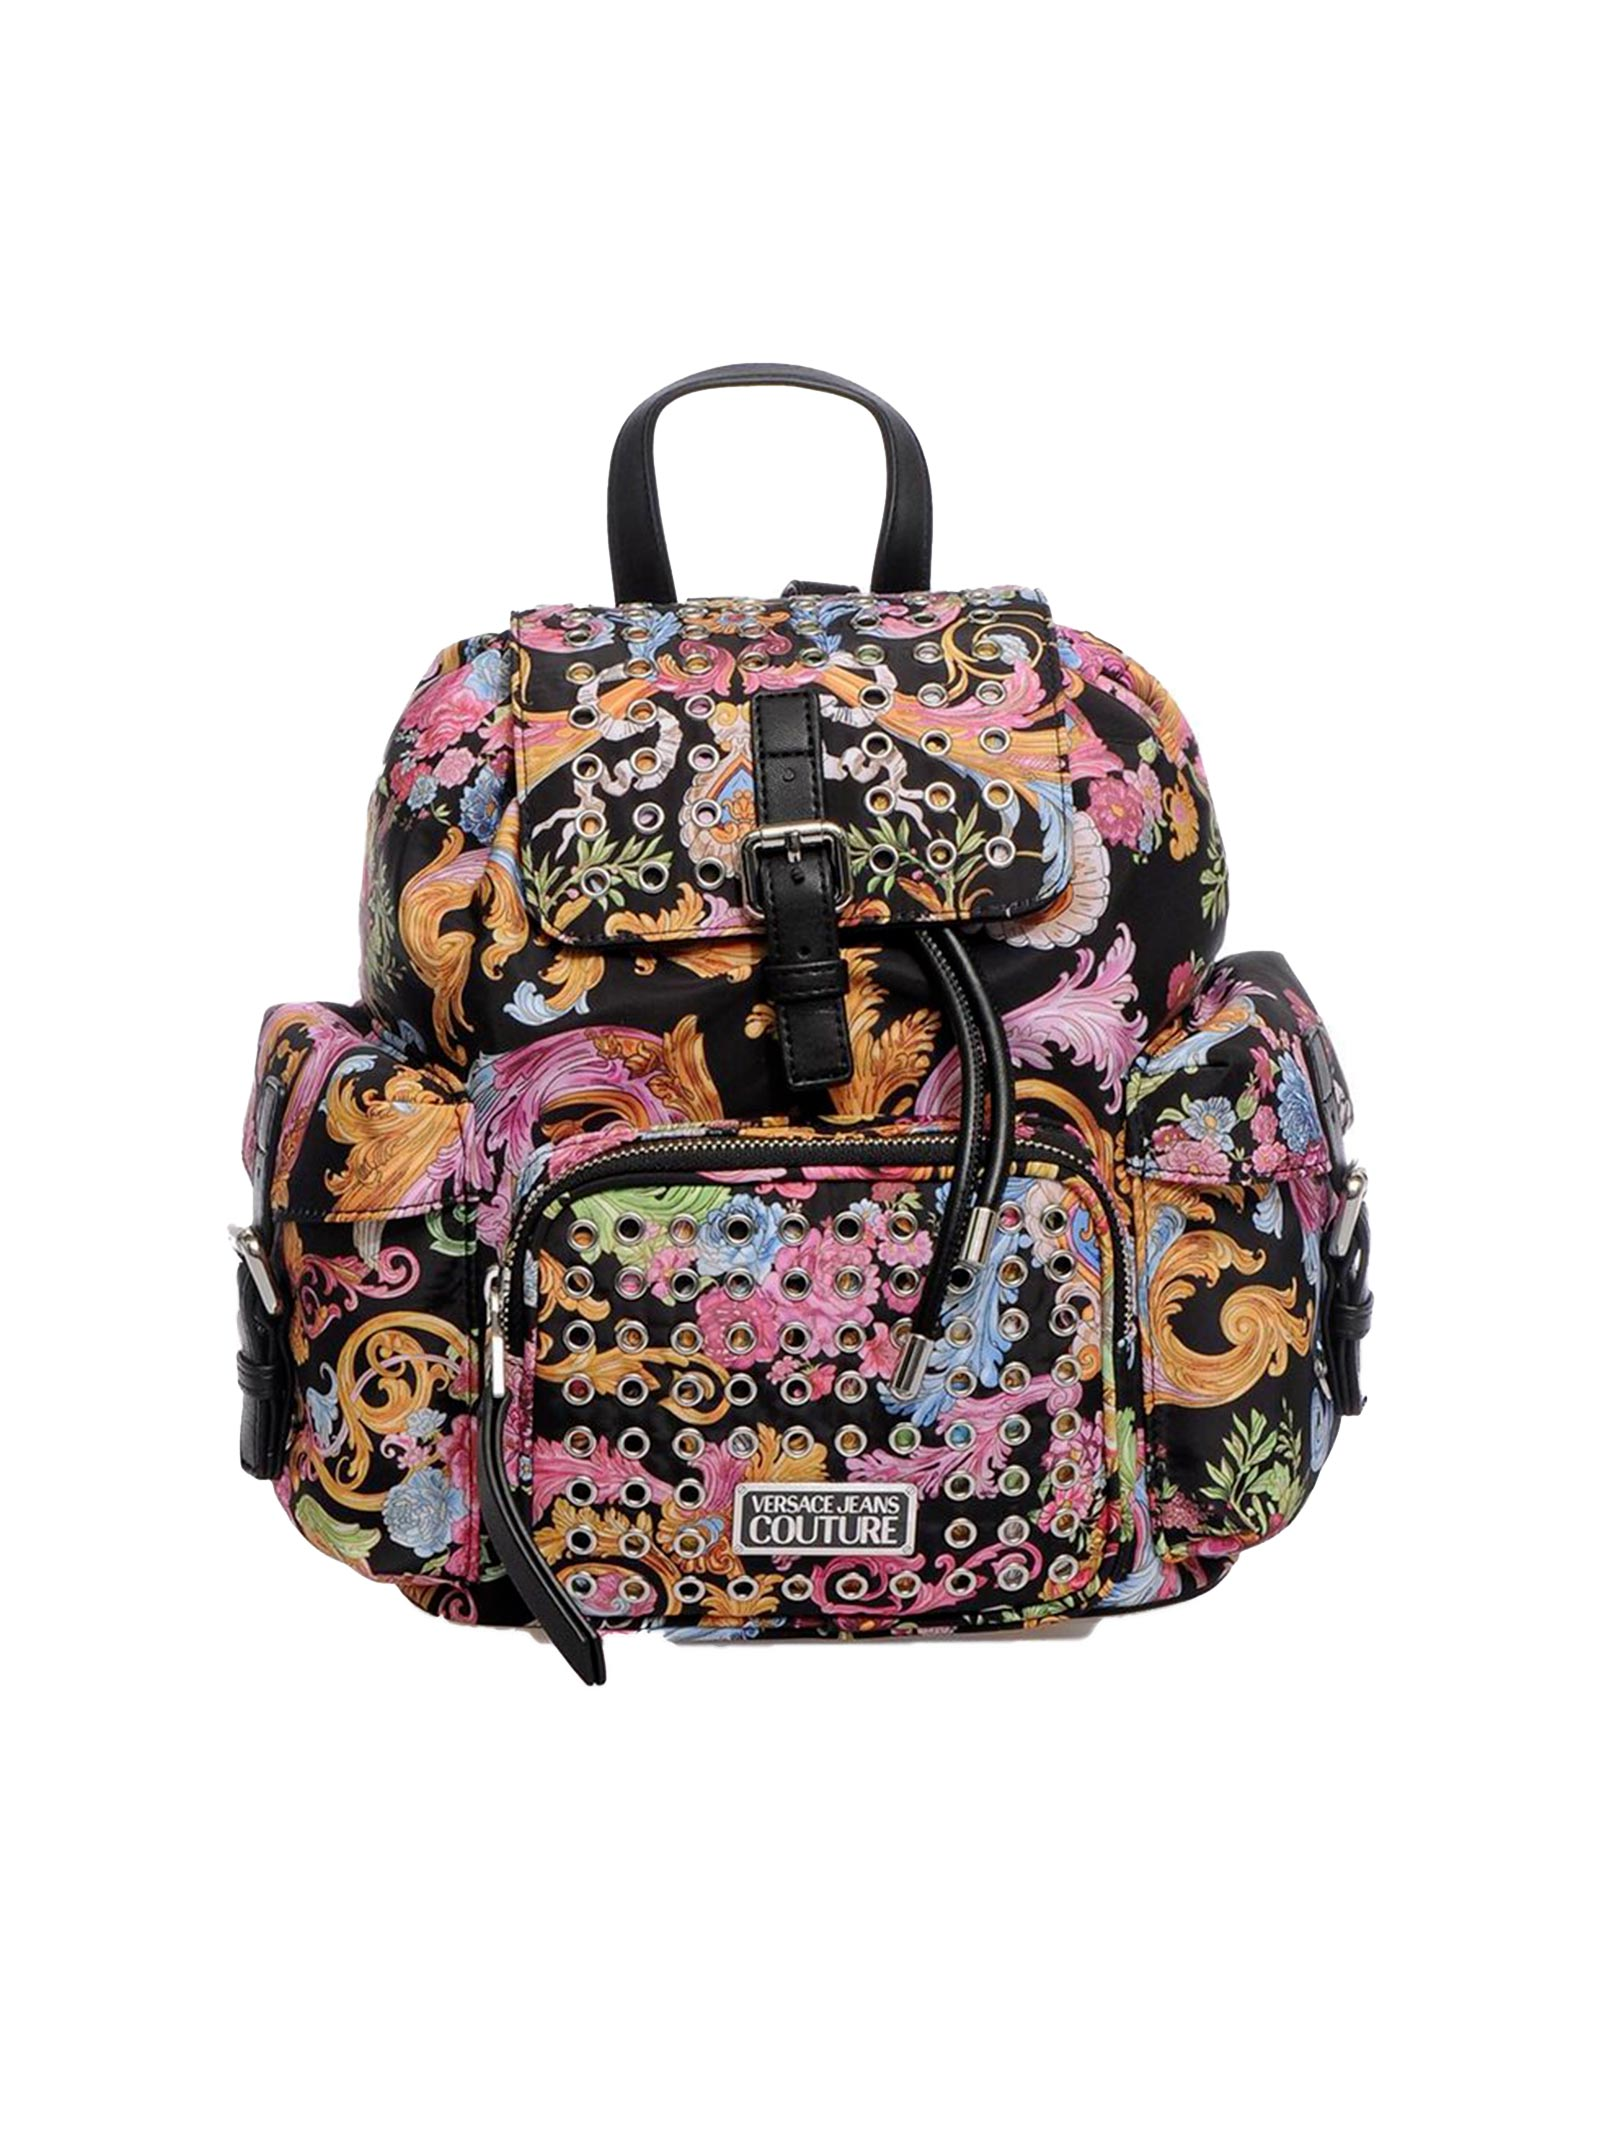 VERSACE JEANS | Backpack | E1 VWABX371887 M09